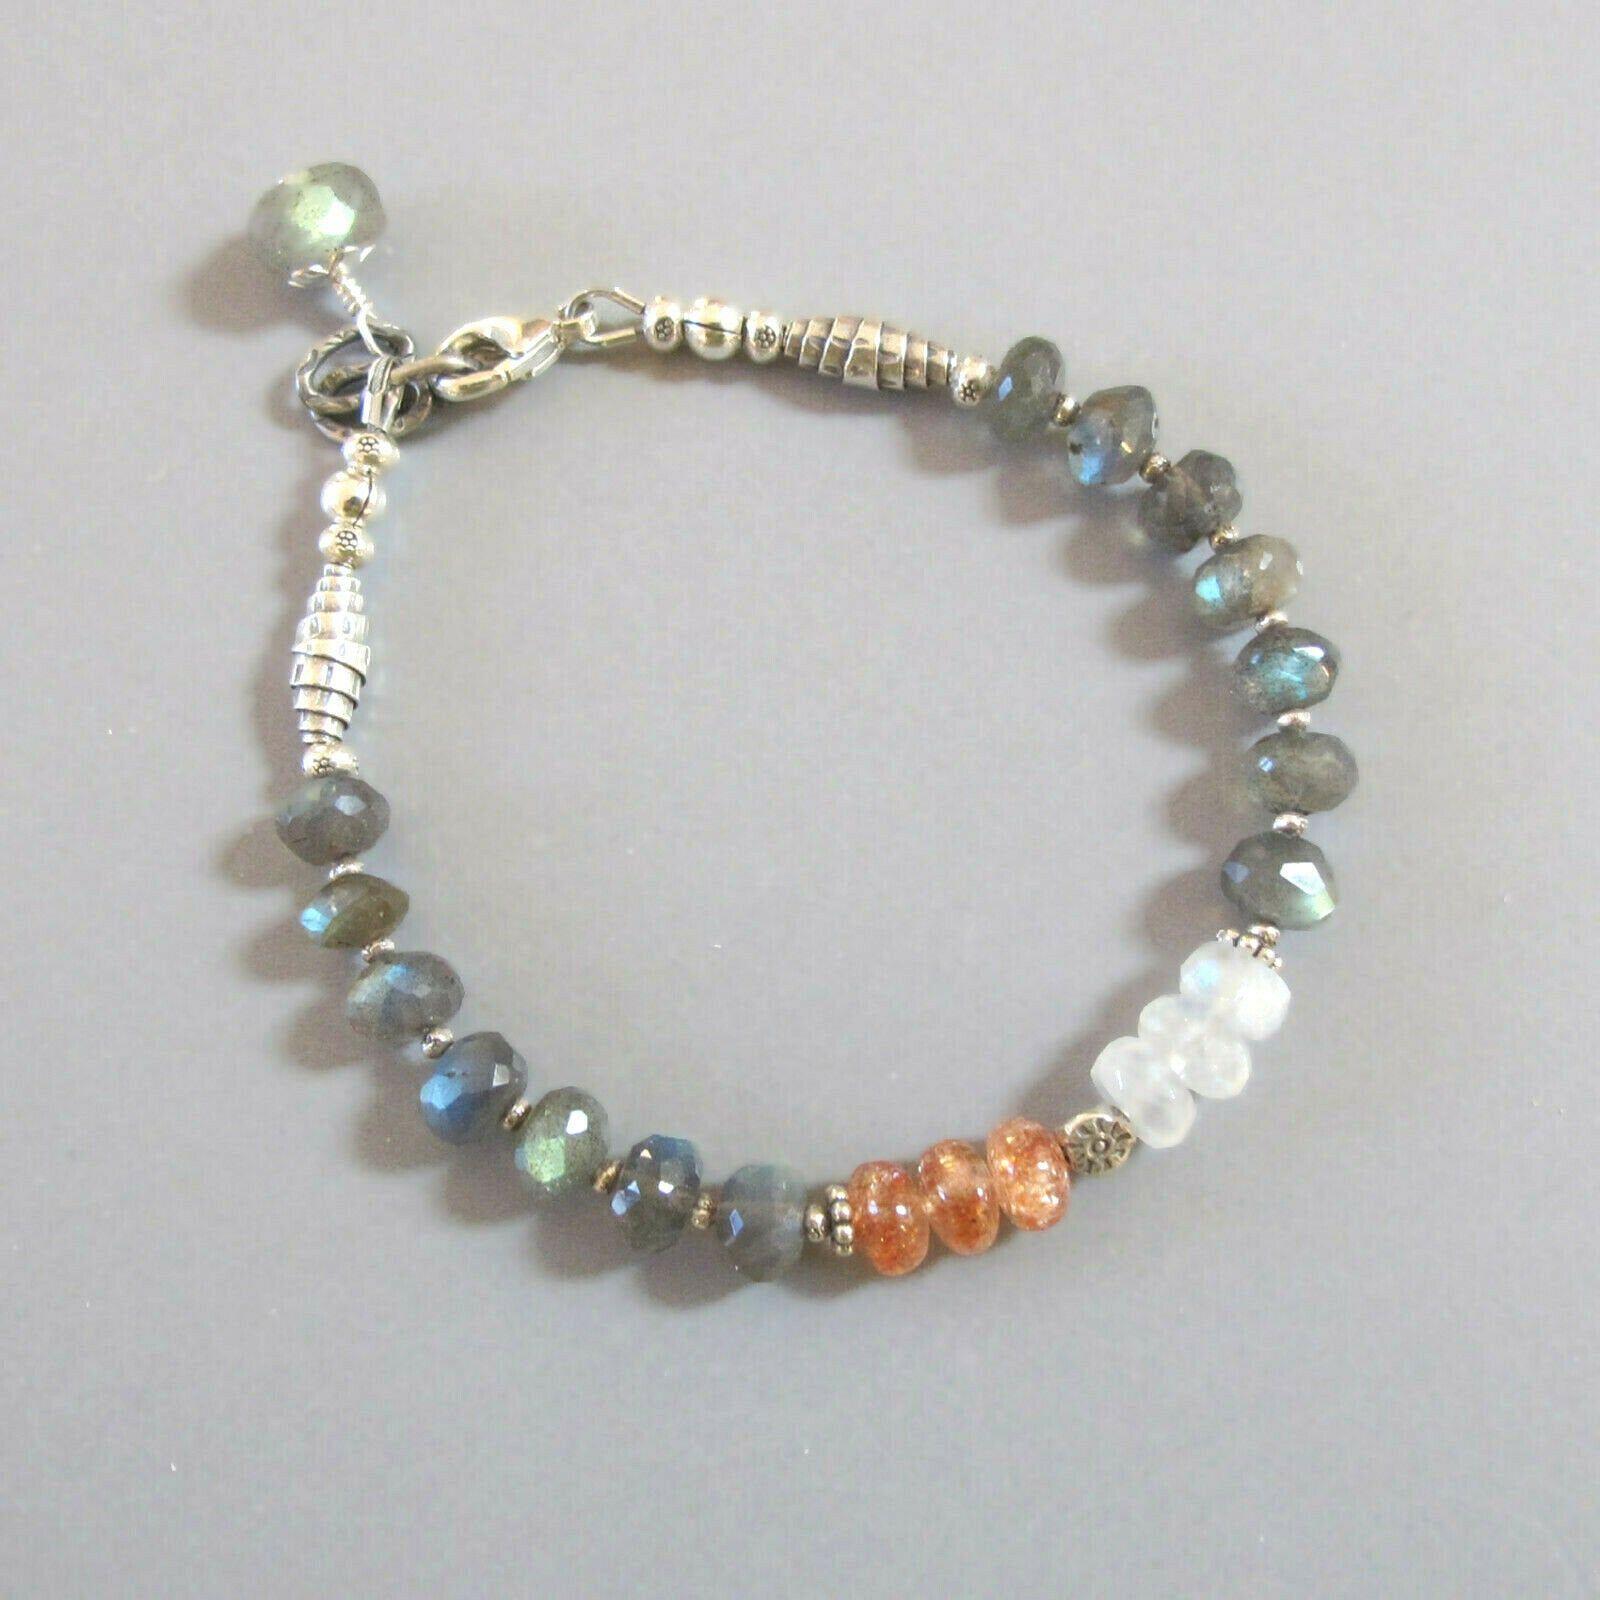 Bali Silver Beads Blue Flash Labradorite Gemstone Jewelry Boho Gray Mystic Labradorite Bracelet